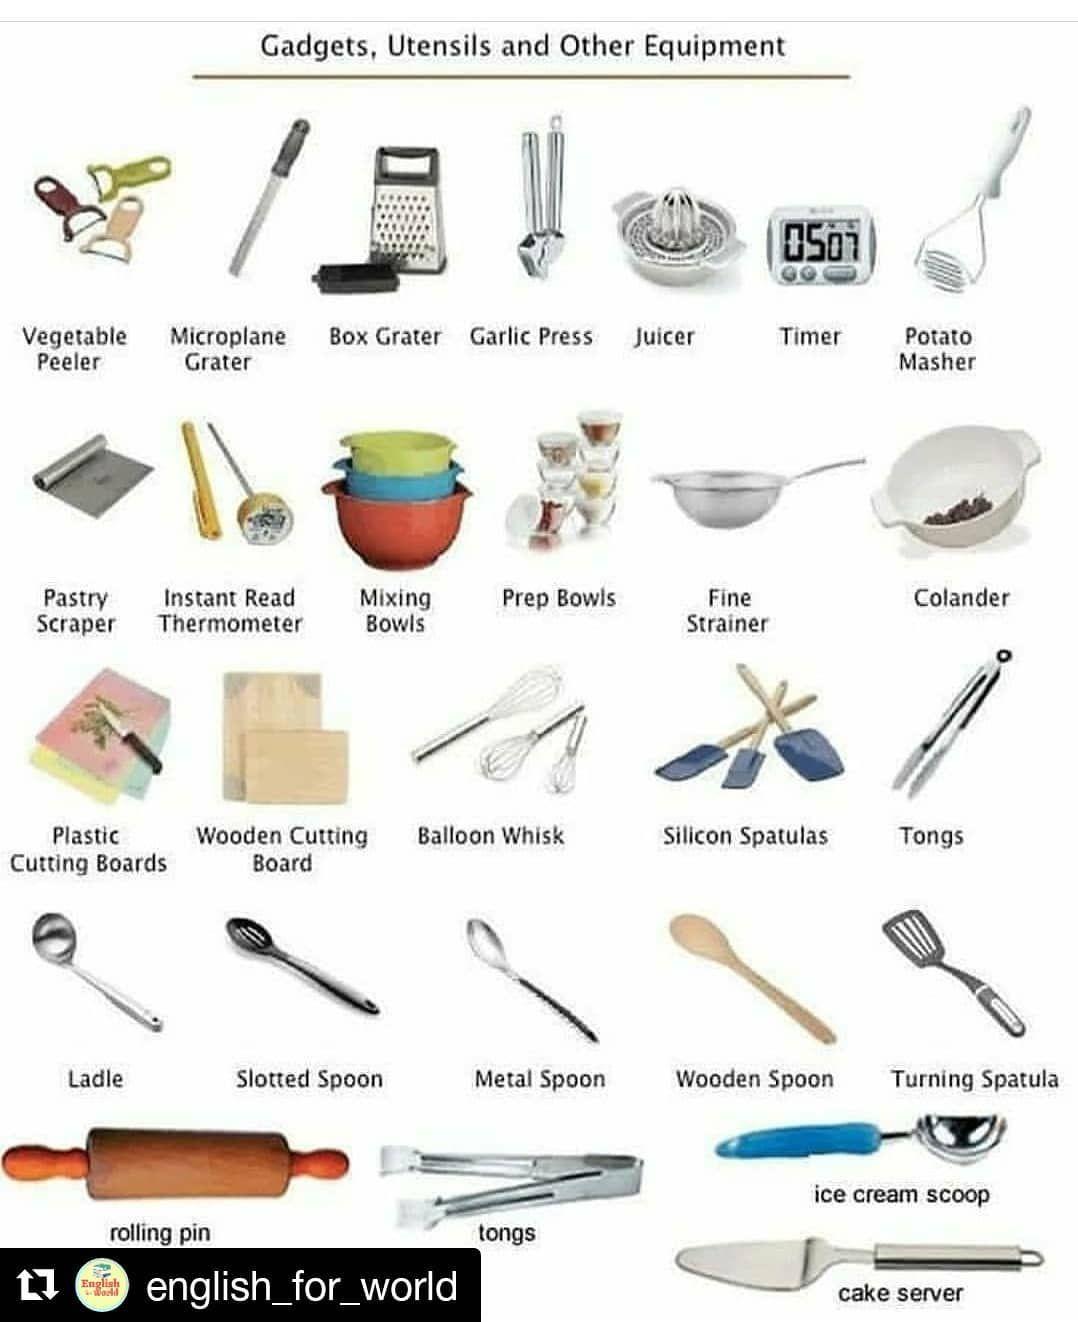 English Grammar Vocabulary On Instagram Repost English For World Get Repost Follow E Kitchen Utensils And Equipment Kitchen Gadgets Kitchen Utensils